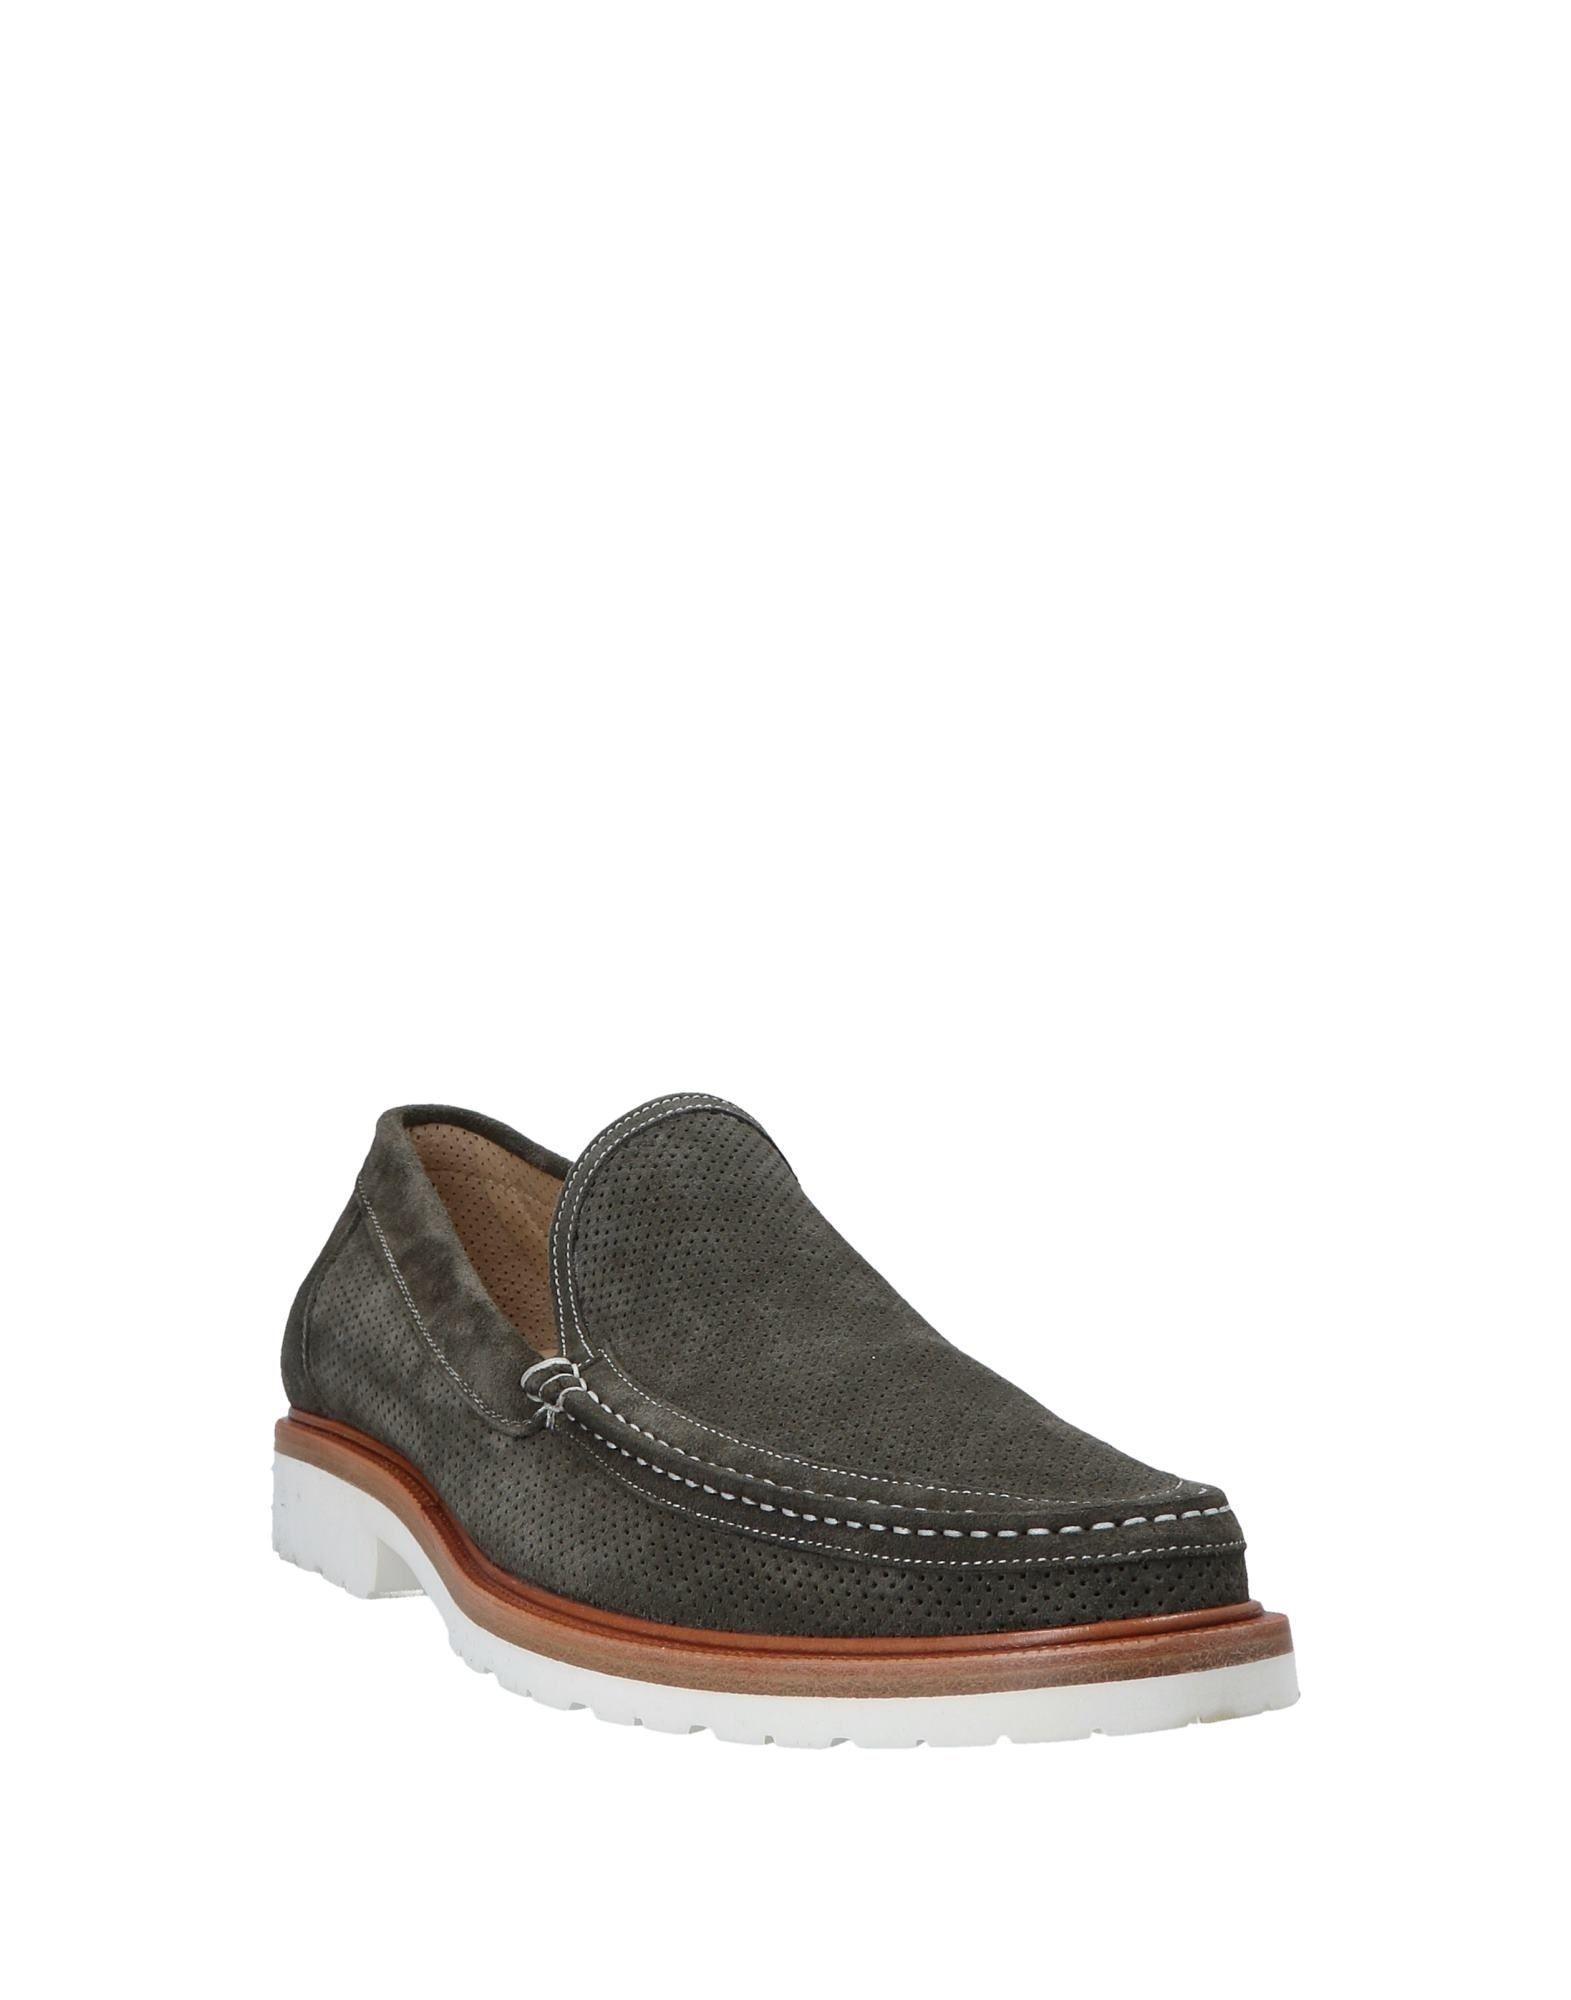 A.Testoni Loafers - - - Men A.Testoni Loafers online on  Australia - 11549881ON c08364